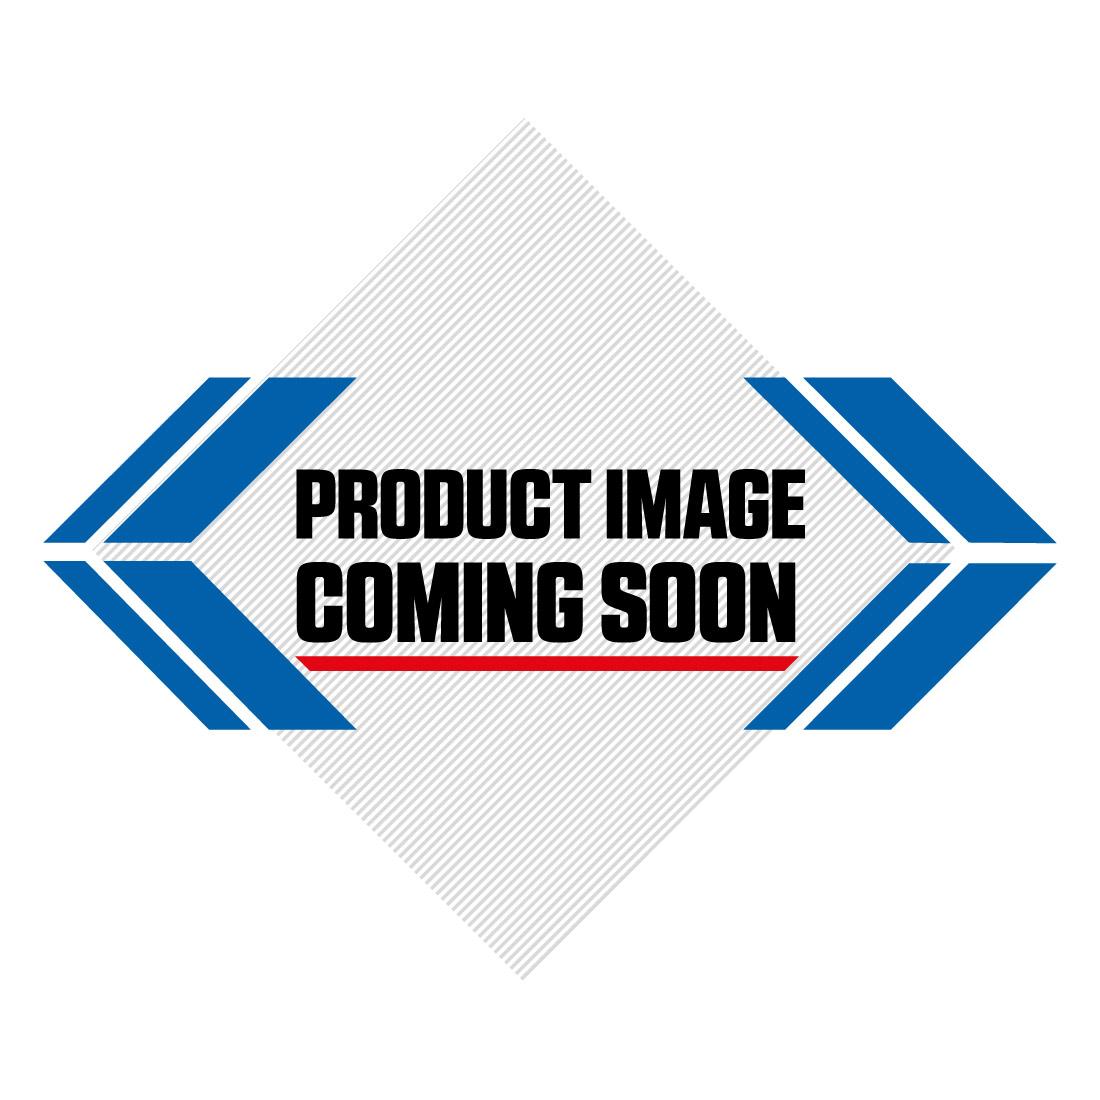 UFO Division Acqua Marina Motocross Kit Combo Image-1